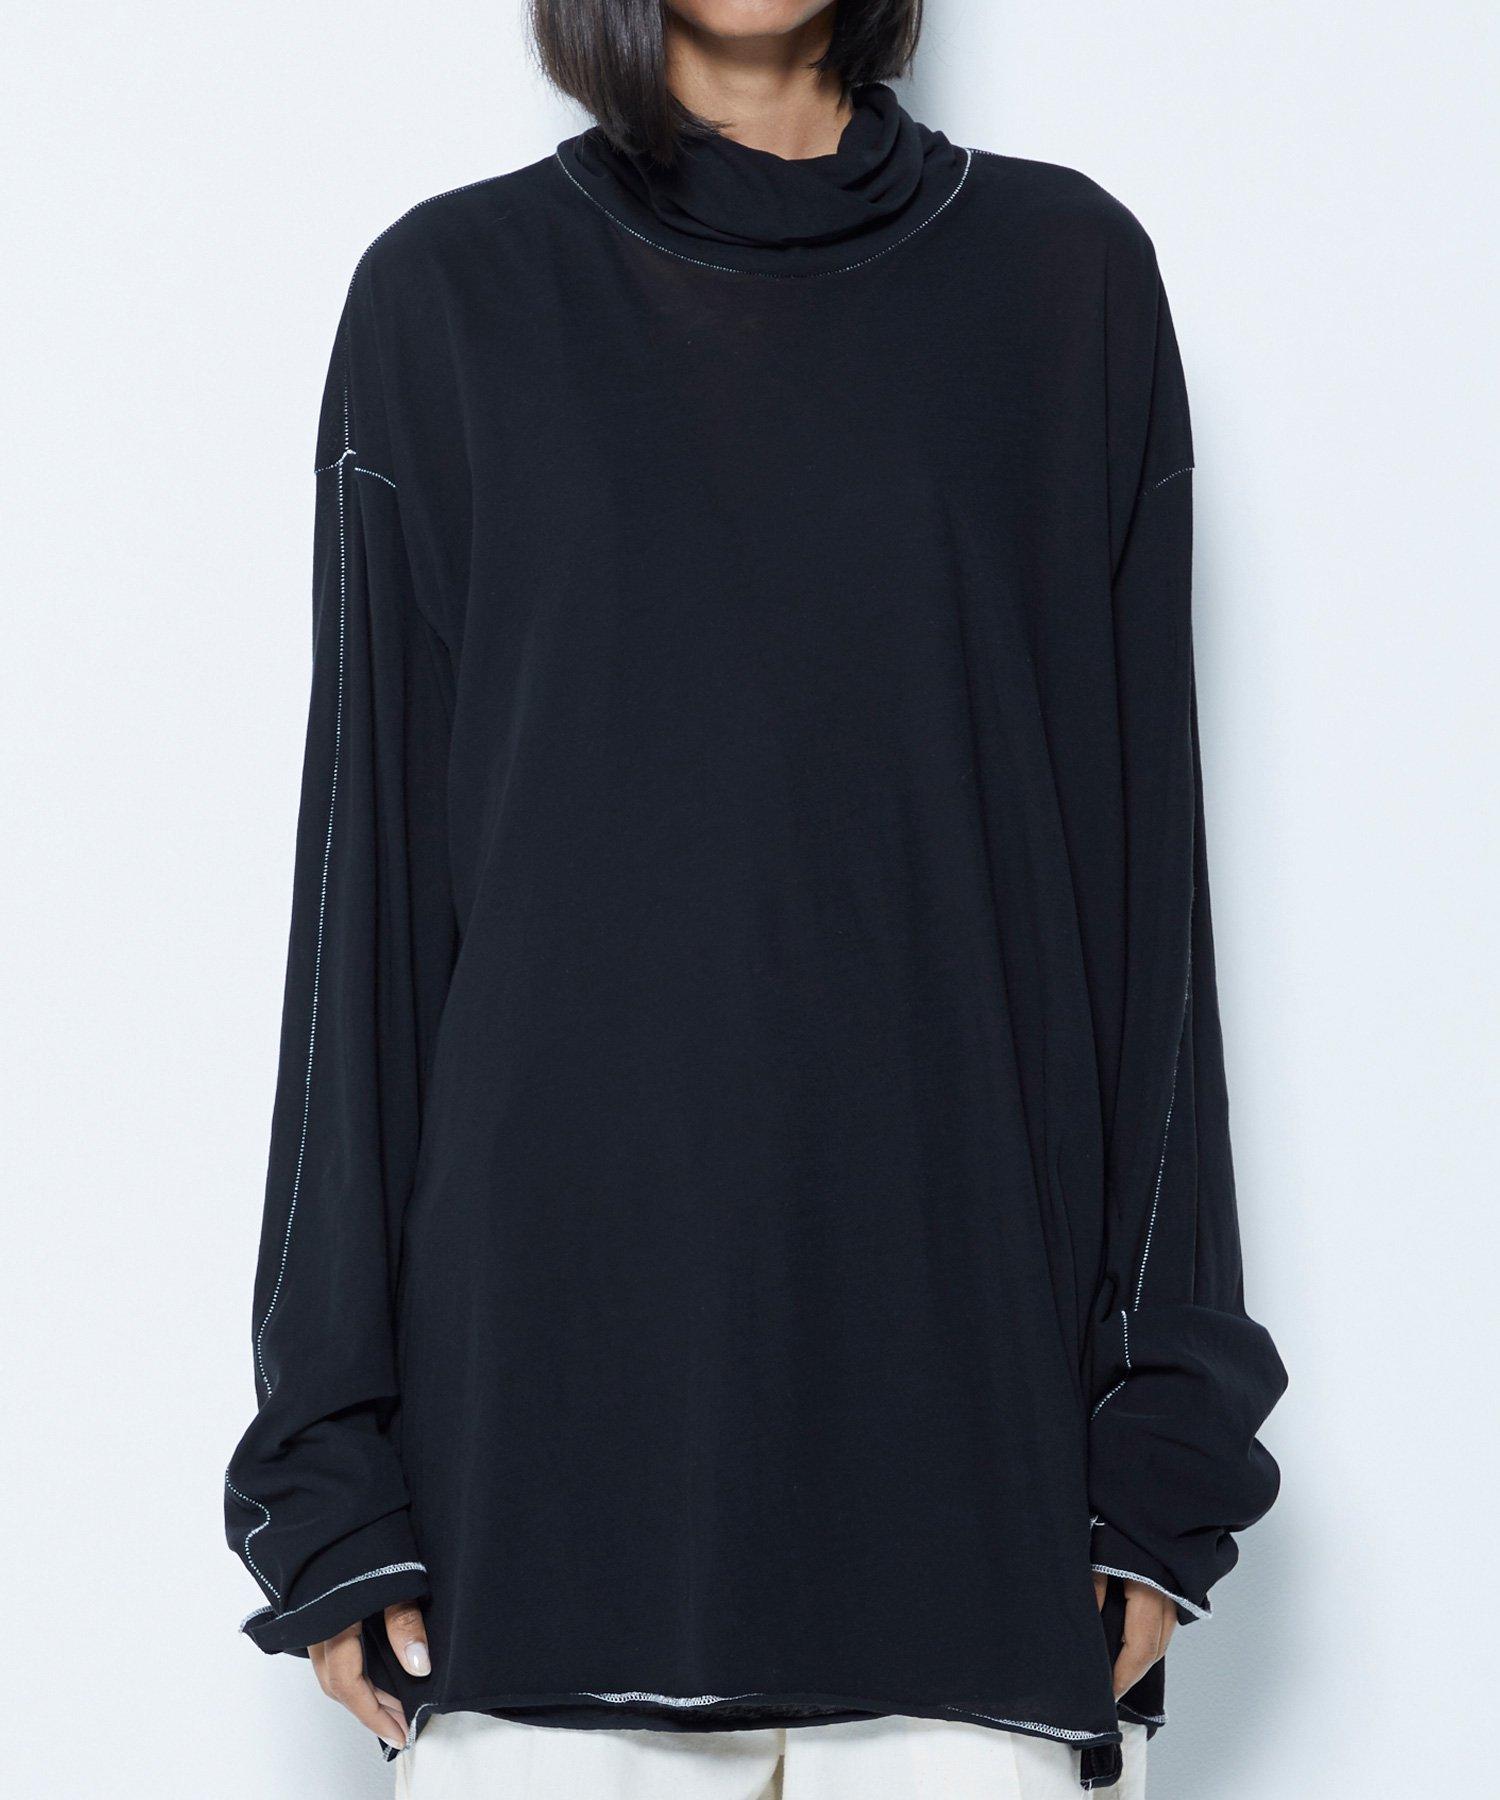 TURTLE NECK L/S 【BLACK】